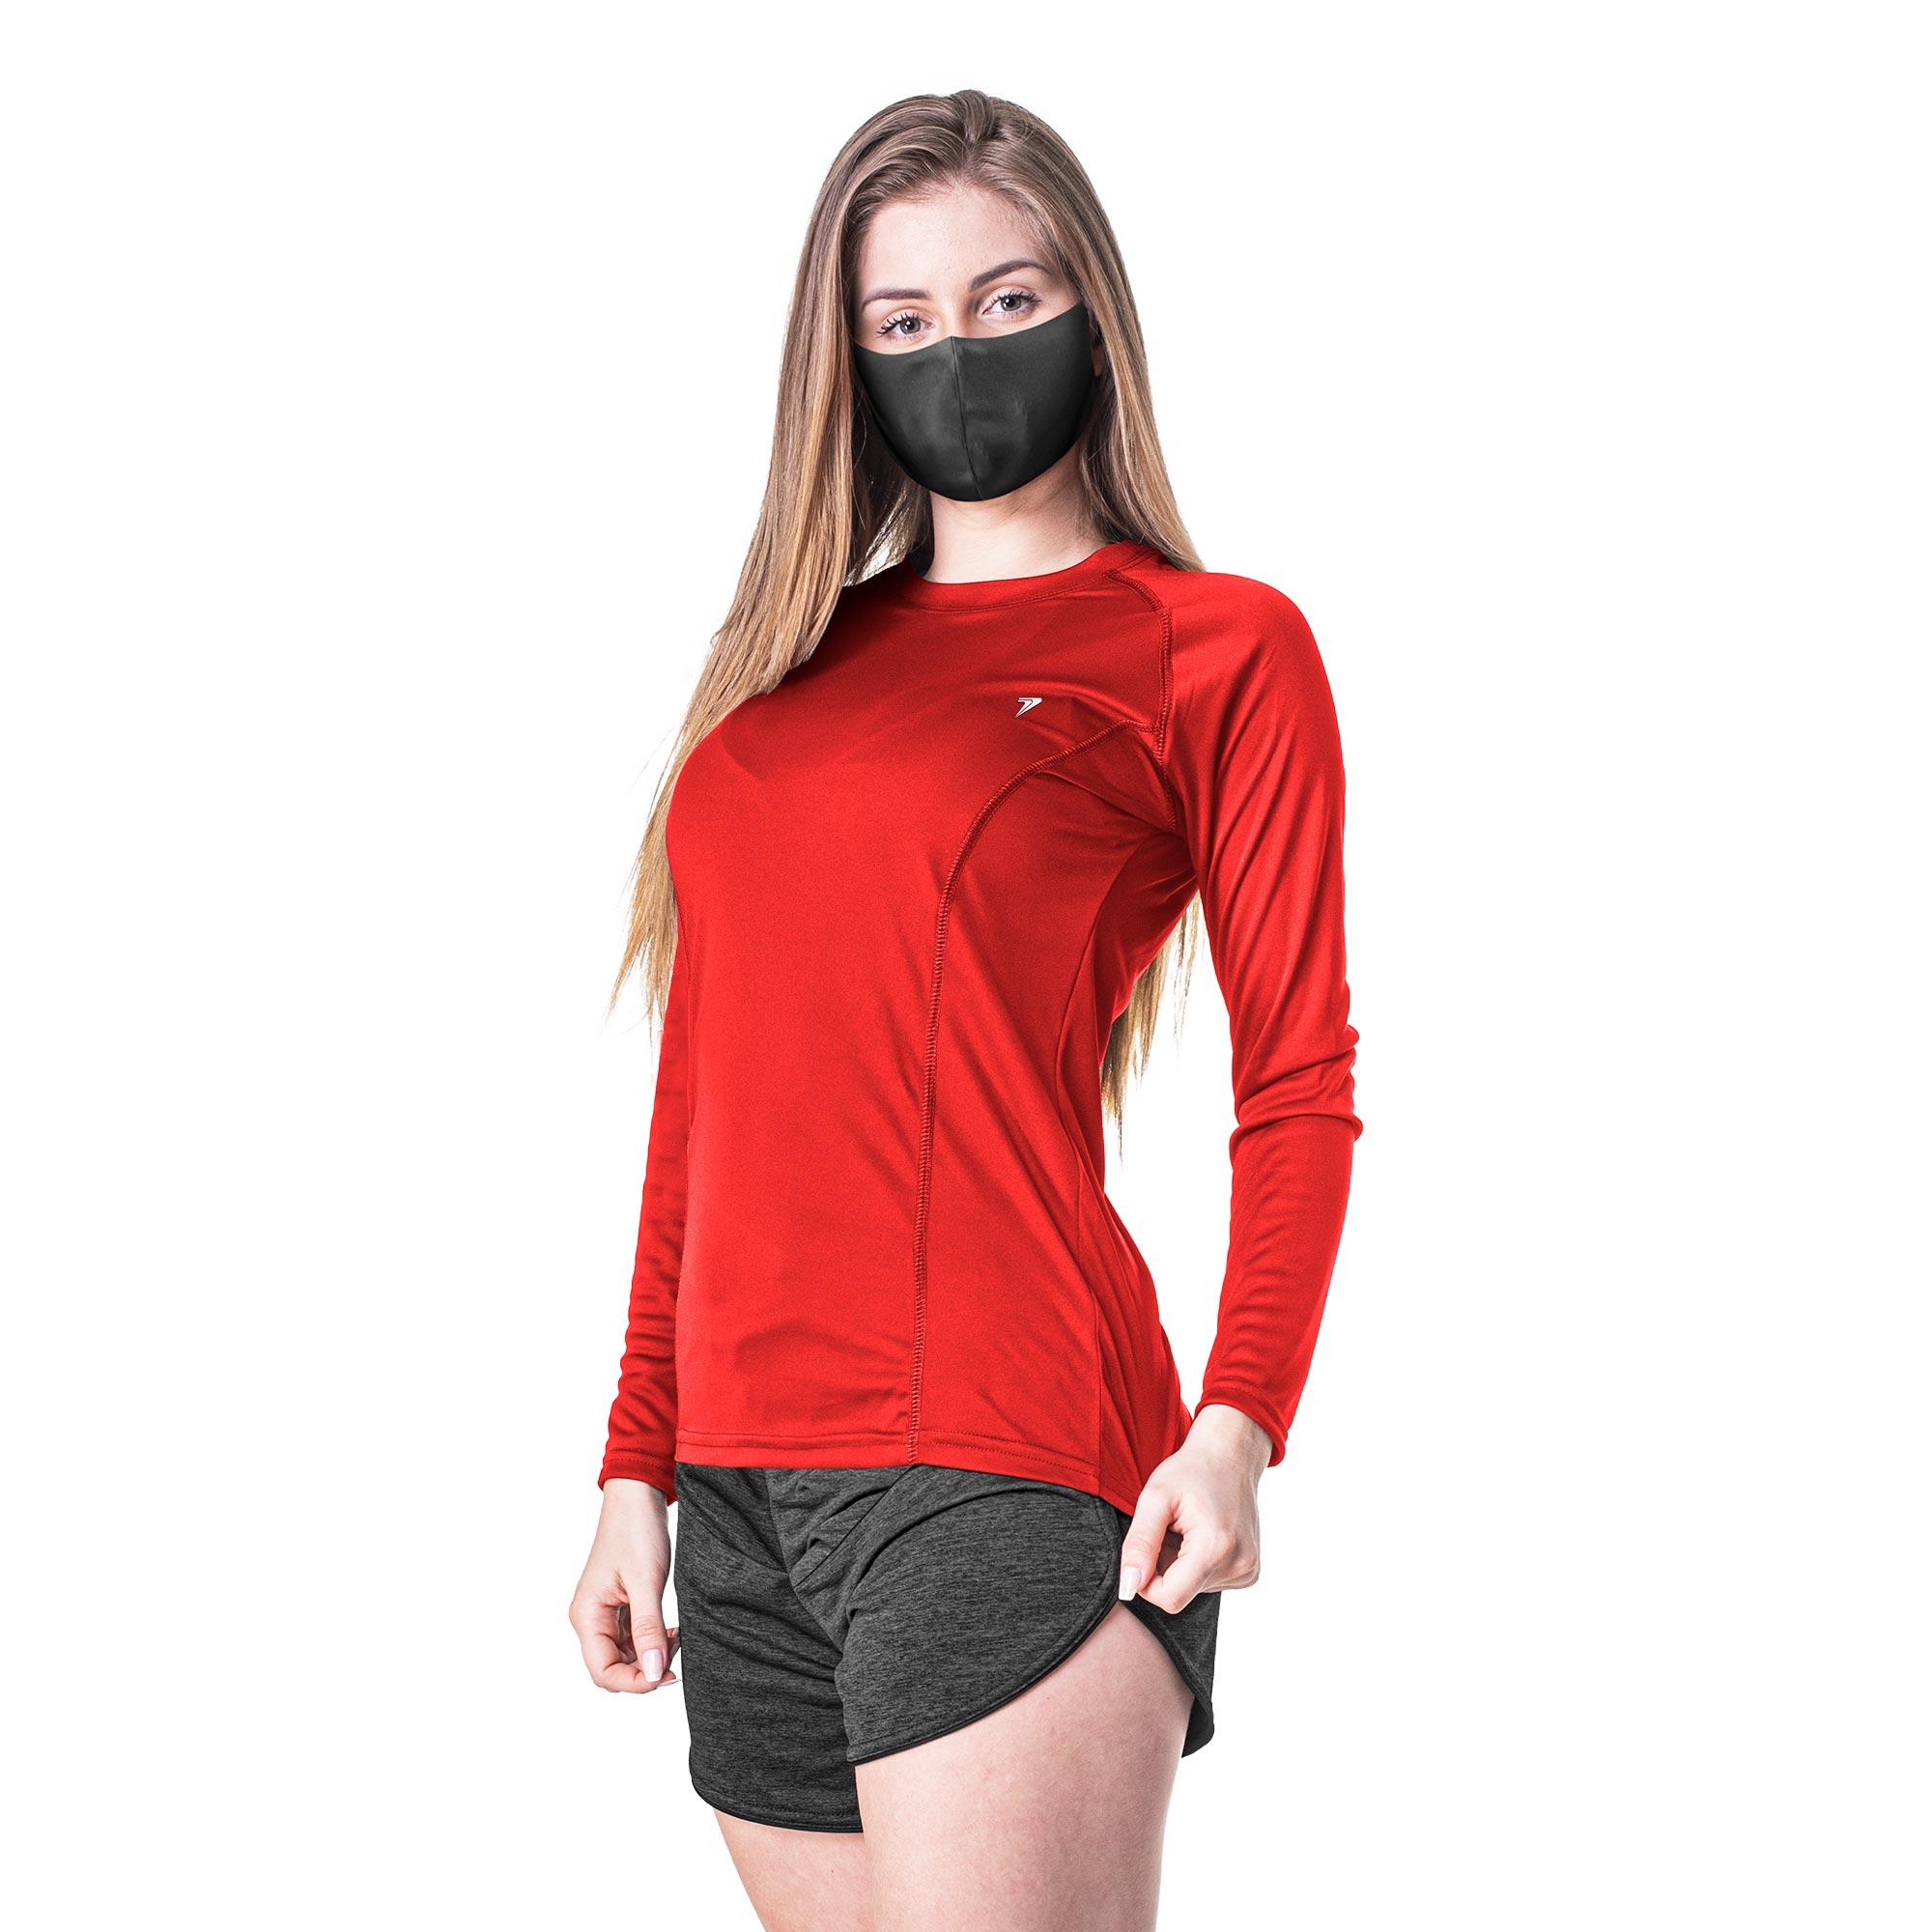 Camisa Feminina M/L Térmica UV Antiviral 04210